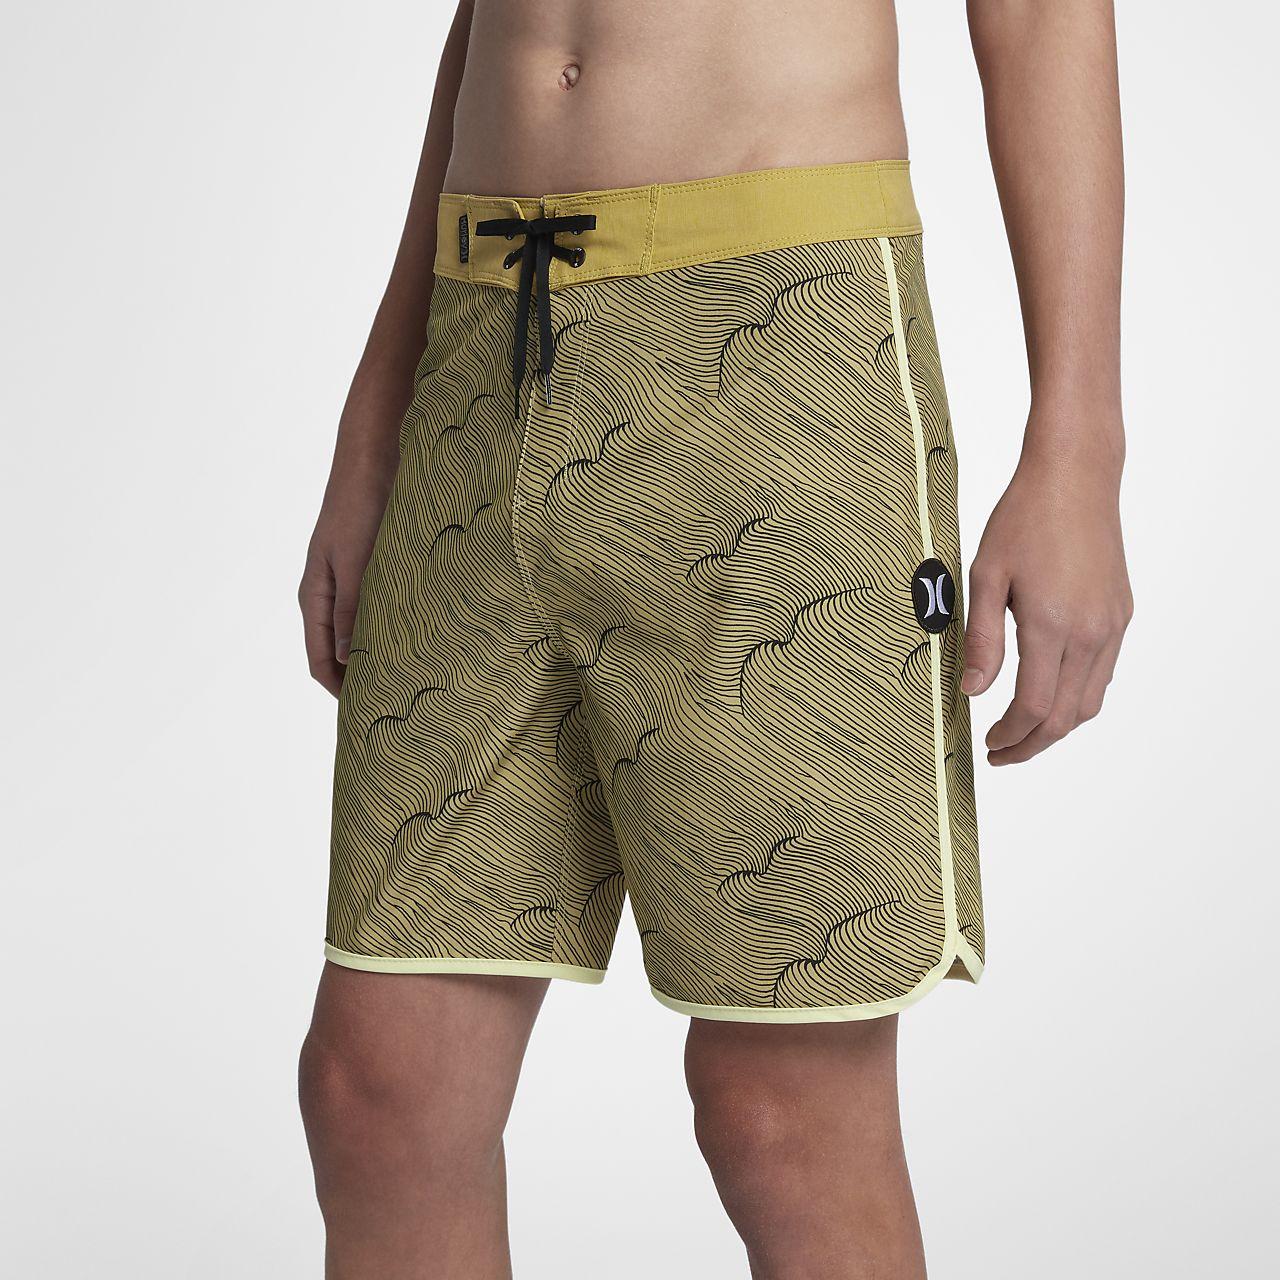 Hurley Phantom Thalia Street Herren-Boardshorts (ca. 45,5 cm)